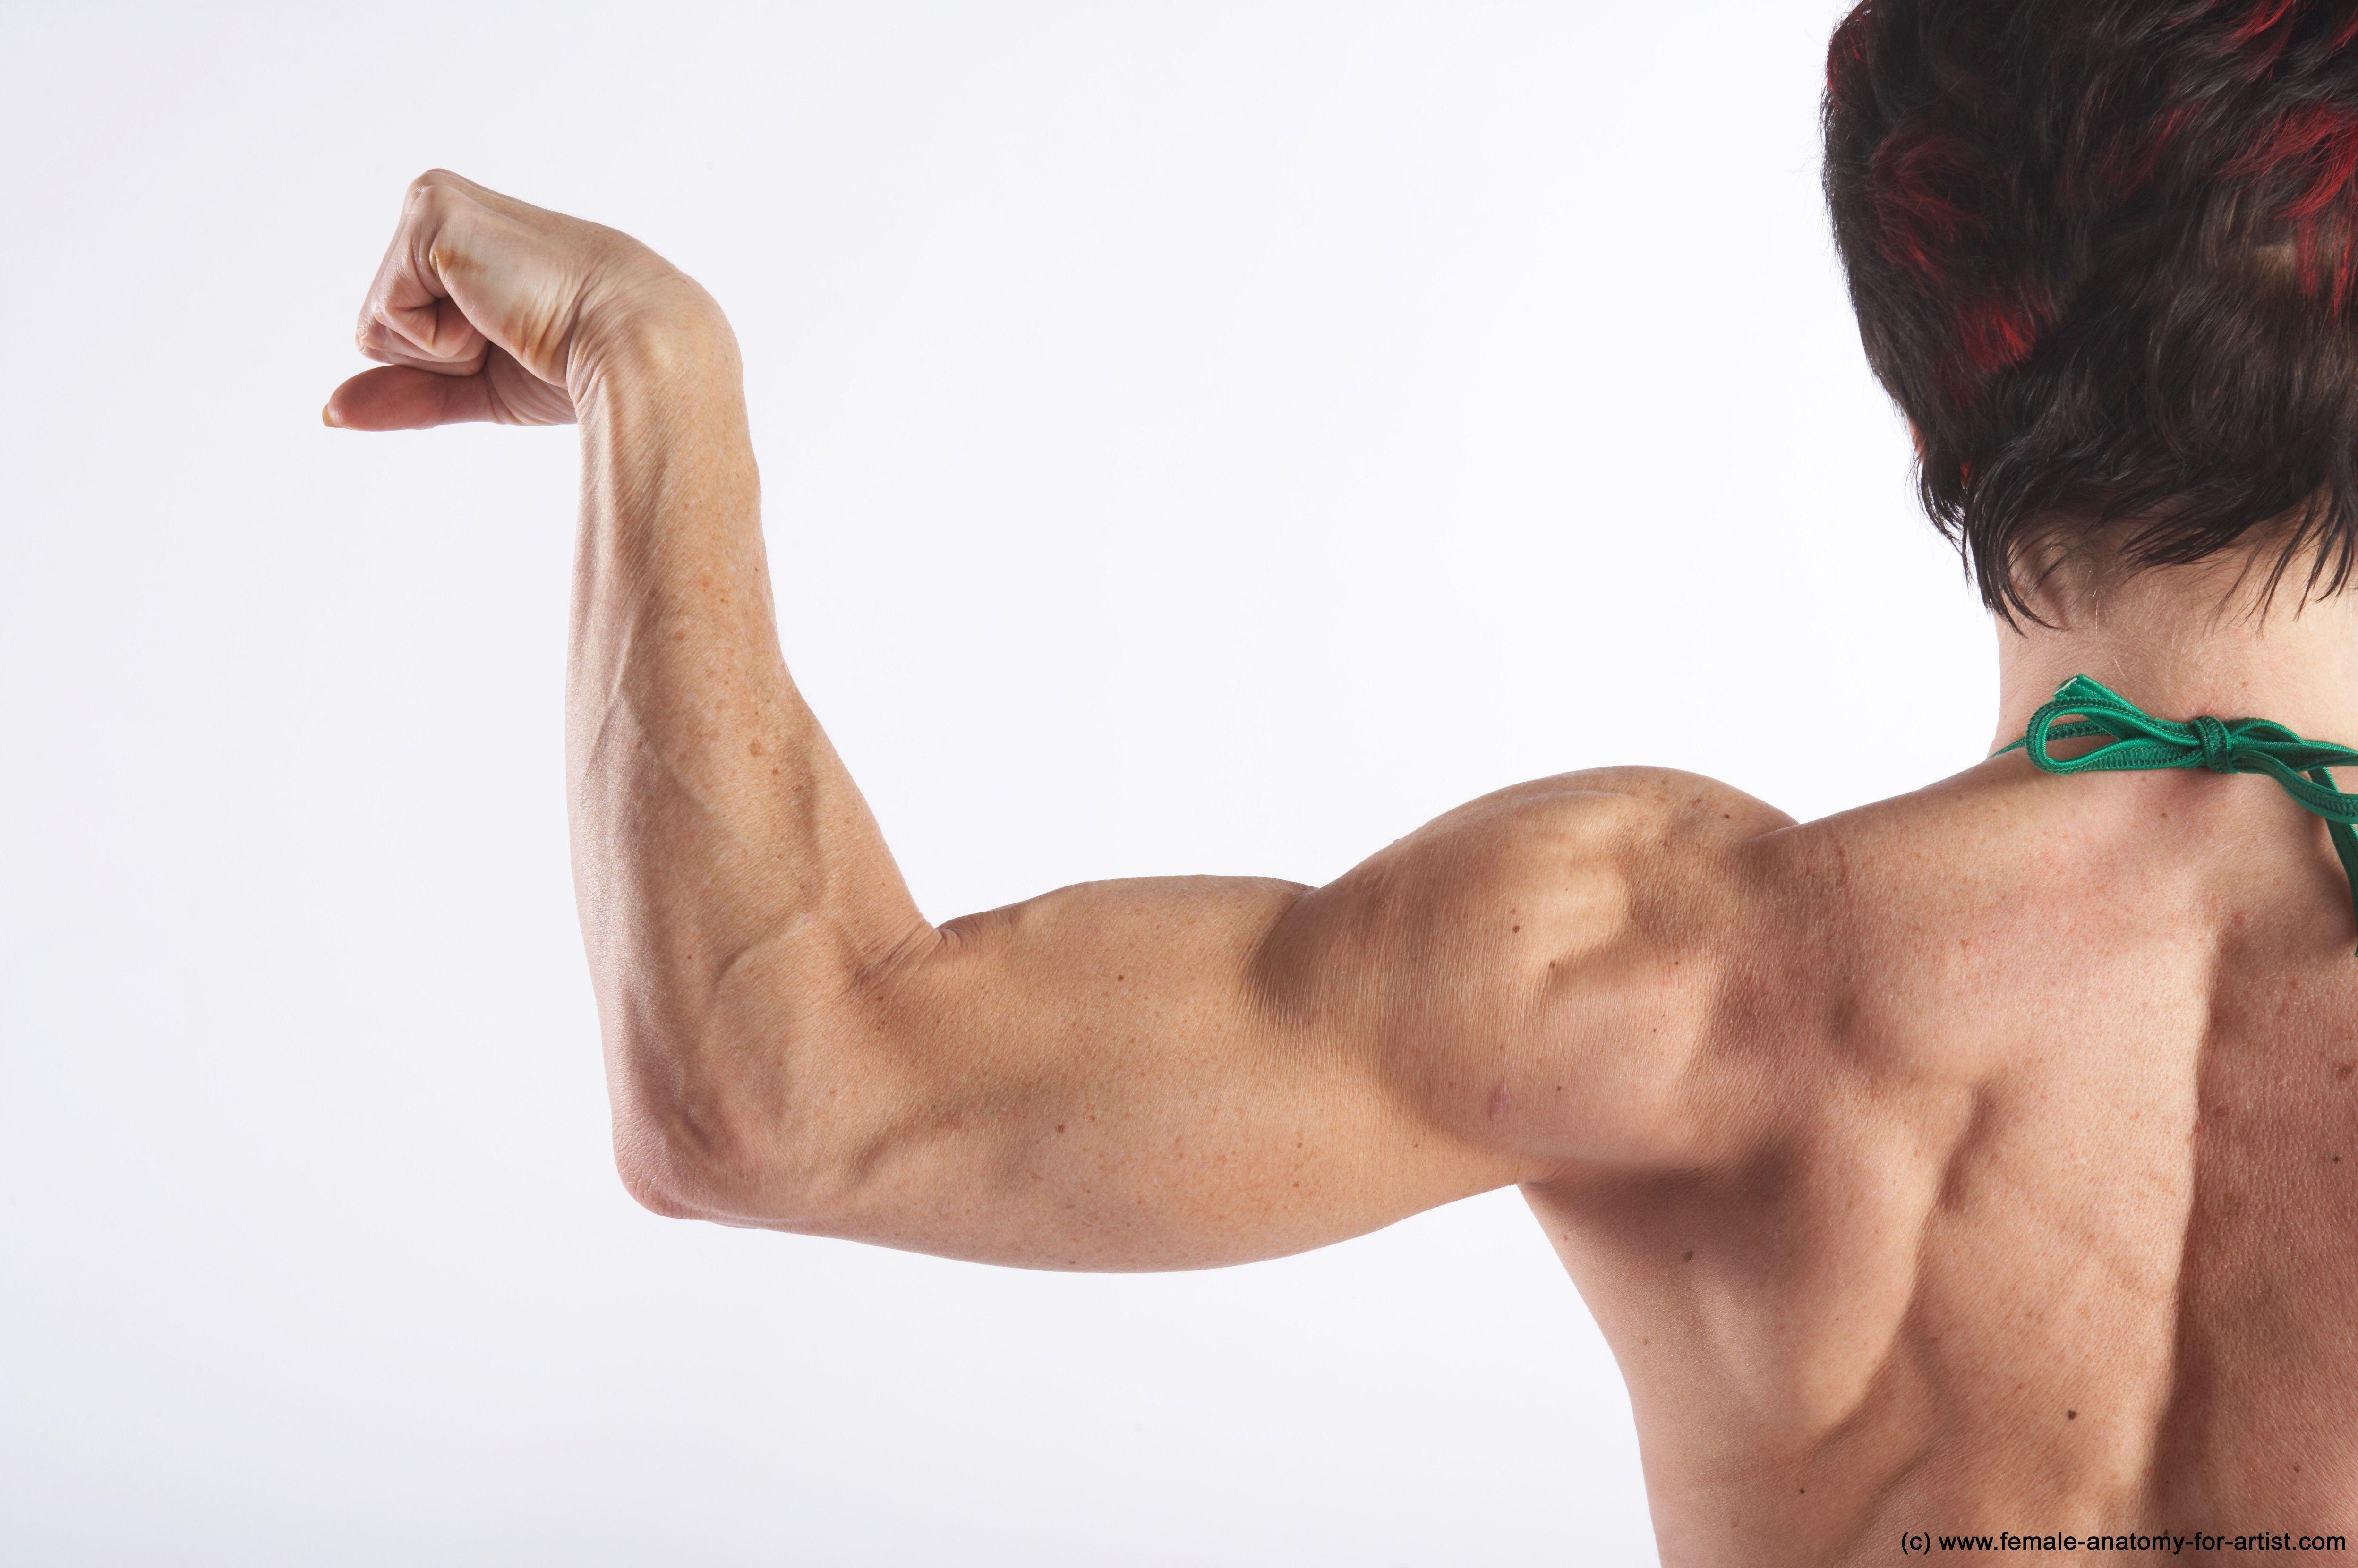 Muscular Arm Model Gizela Credit Female Anatomy For Artist